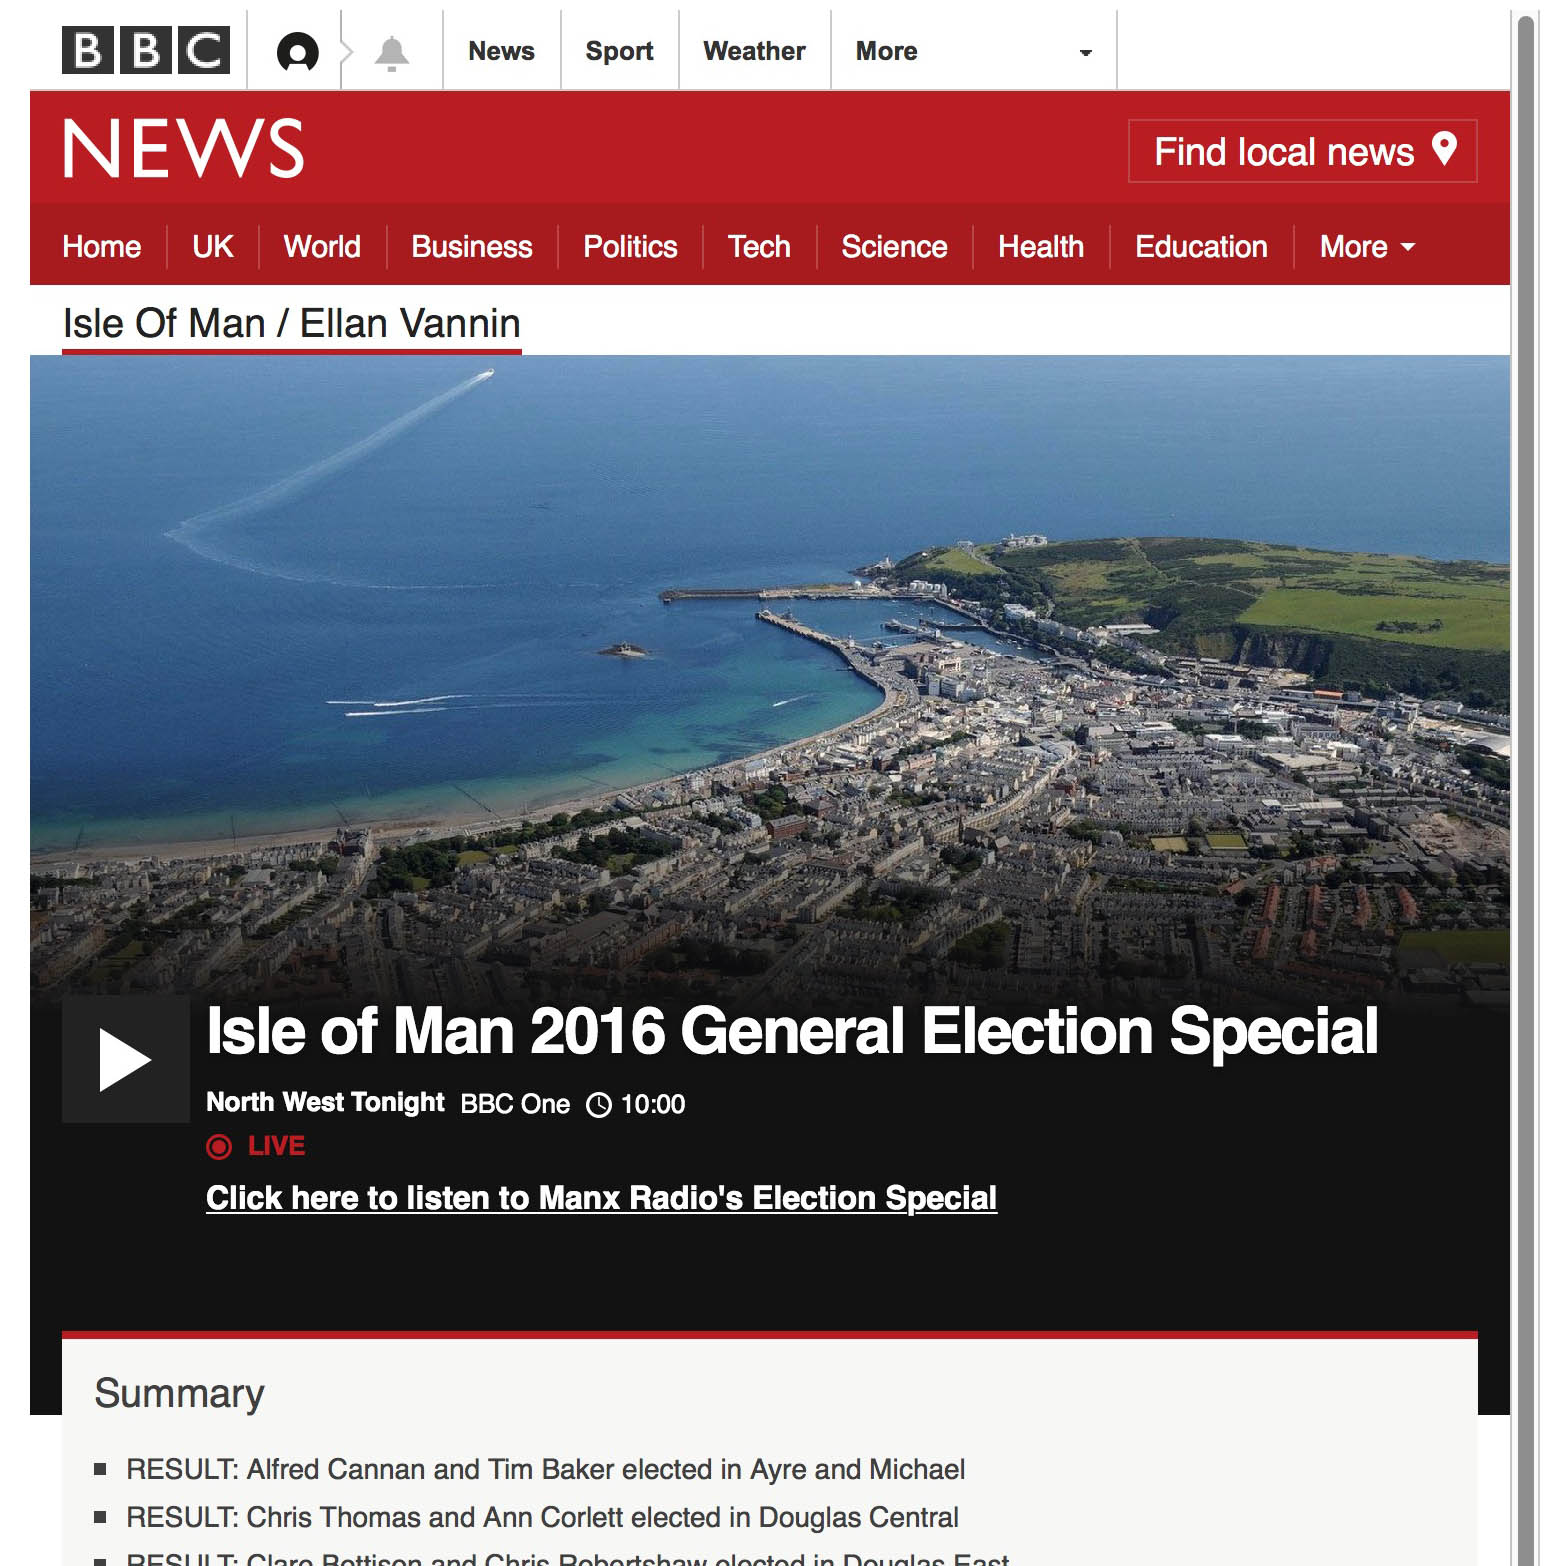 http---www.bbc.co.uk-news-live-world-europe-isle-of-man-37361890 (20160923).jpg